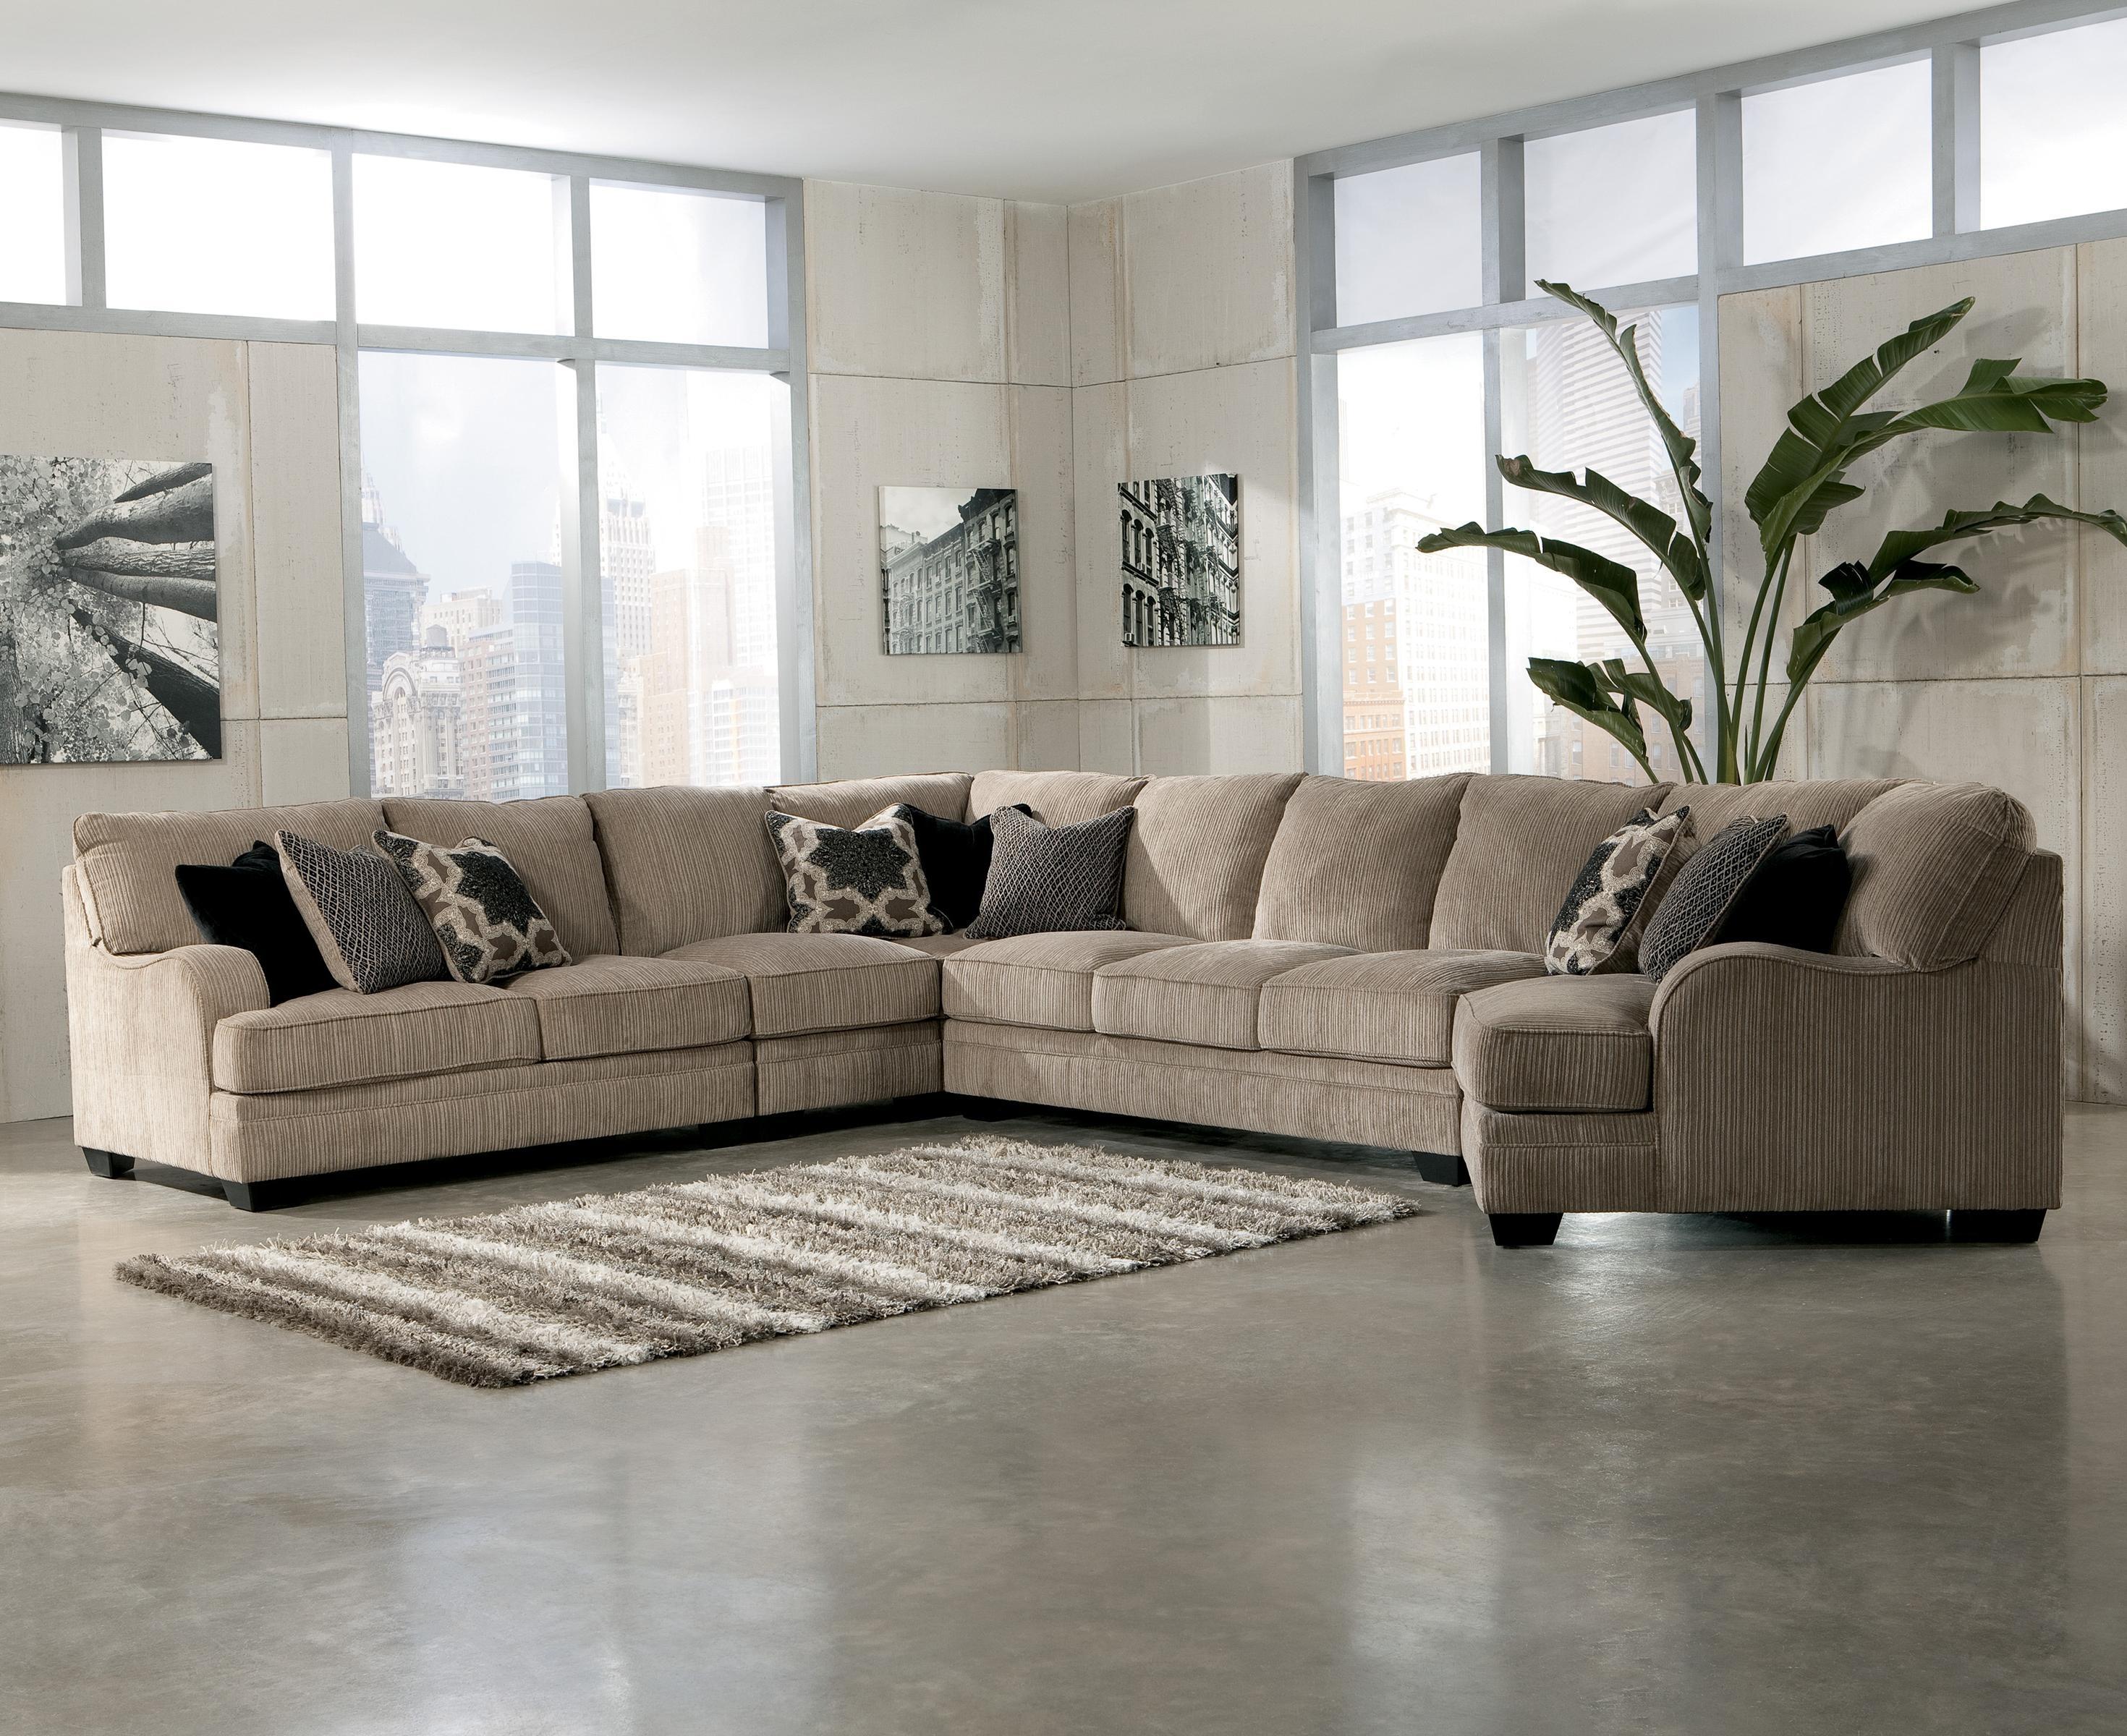 Signature Designashley Katisha – Platinum 5 Piece Sectional Sofa Inside Pittsburgh Sectional Sofas (View 7 of 10)